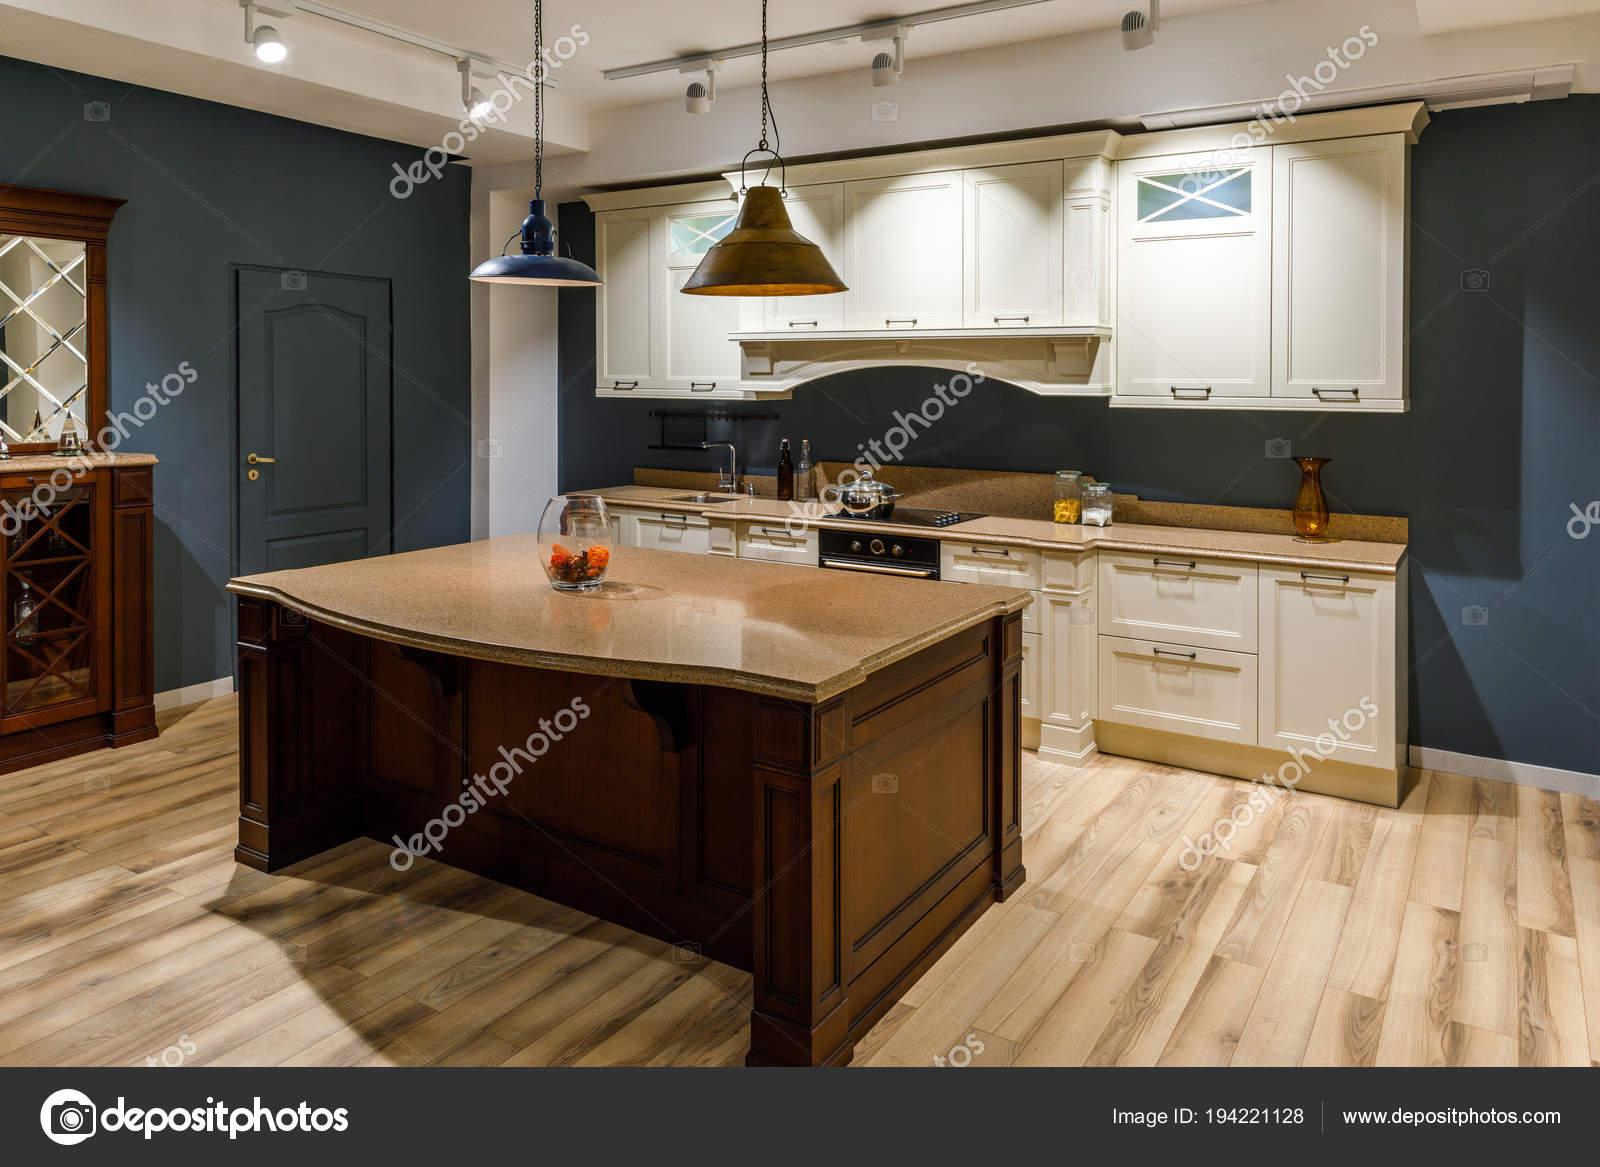 www.kitchen cabinets white drop leaf kitchen table 时尚的厨房与典雅的木制柜台和白色橱柜 图库照片 c antonmatyukha 194221128